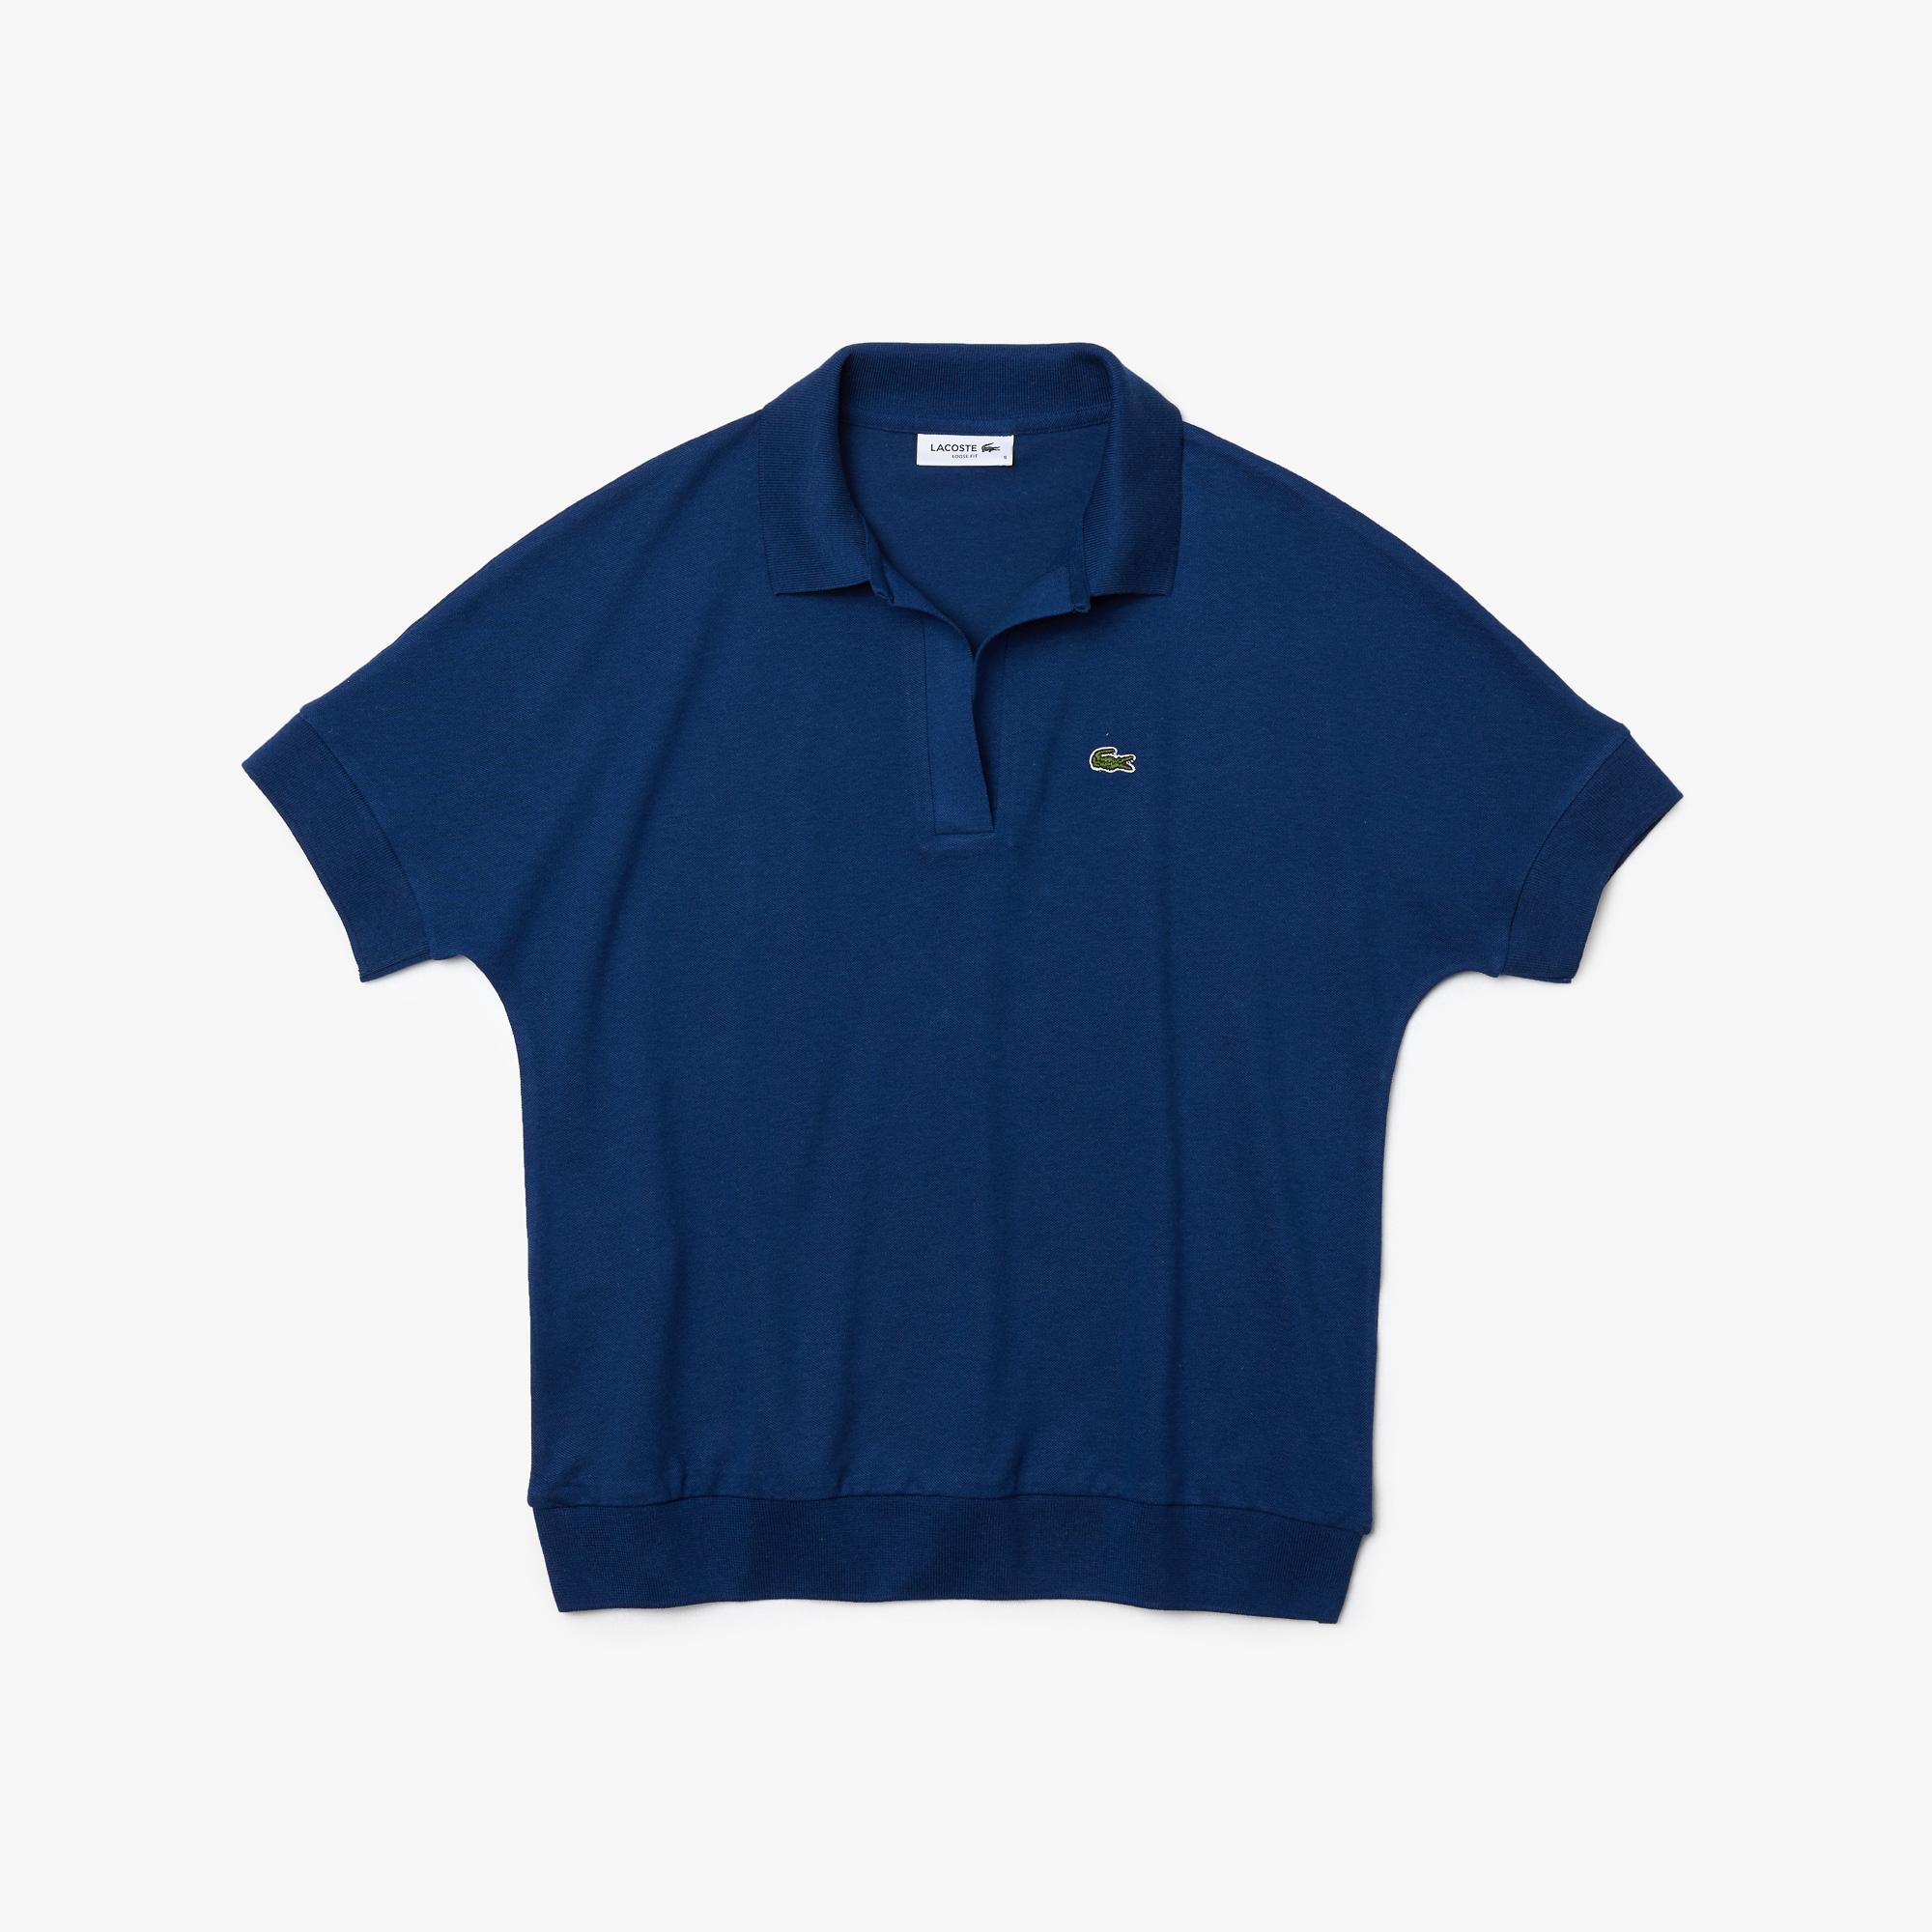 Lacoste Kadın Mavi Polo